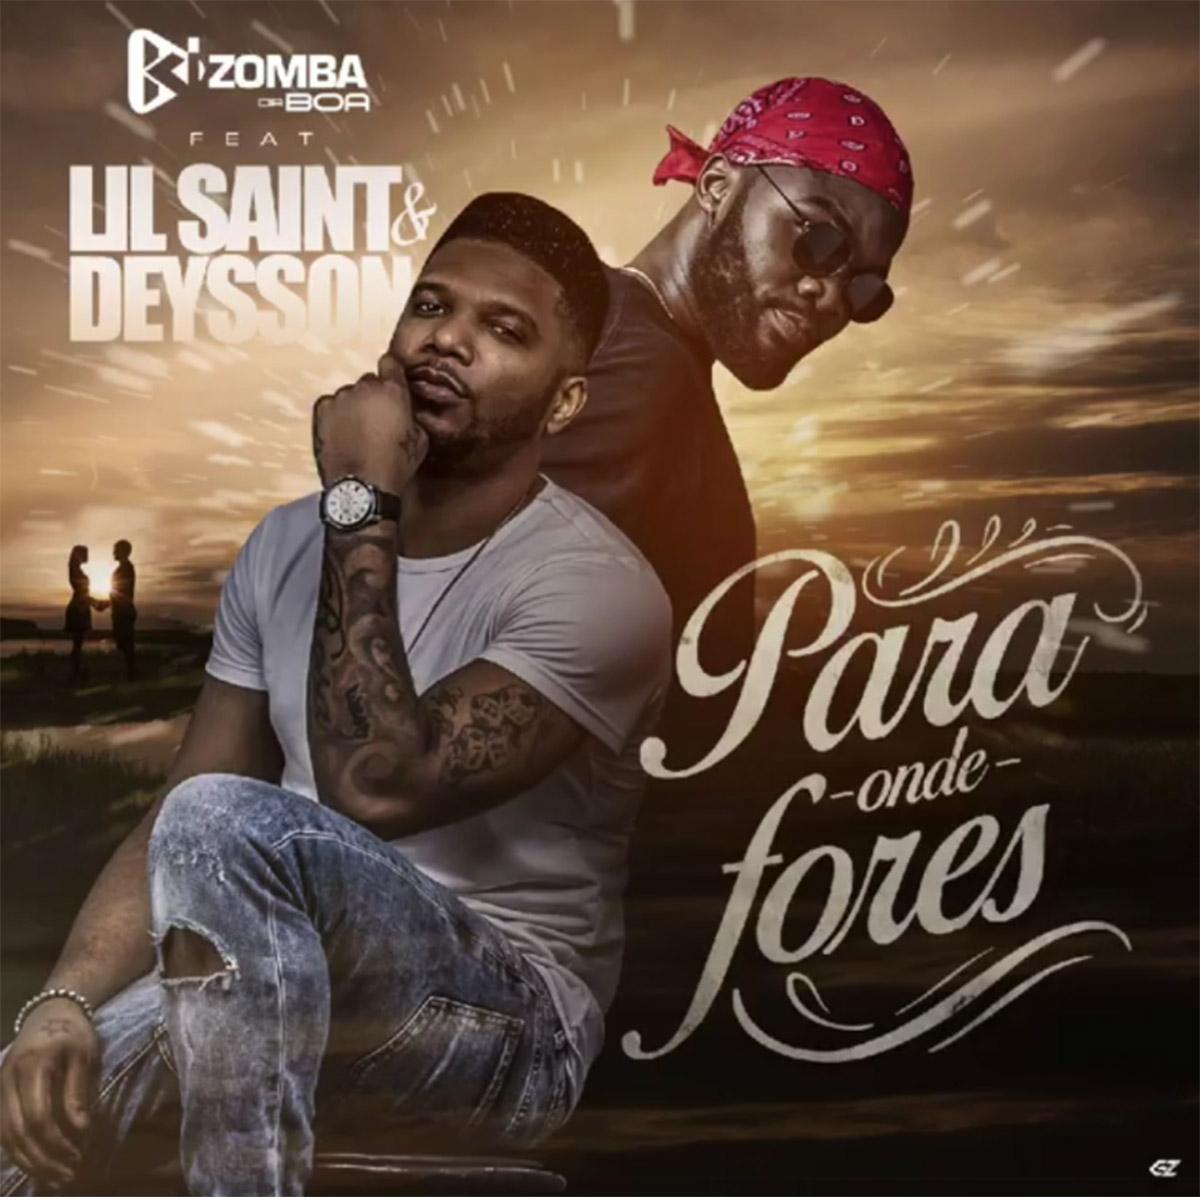 Kizomba da Boa – Para Onde Fores (feat. Lil Saint & Deysson)